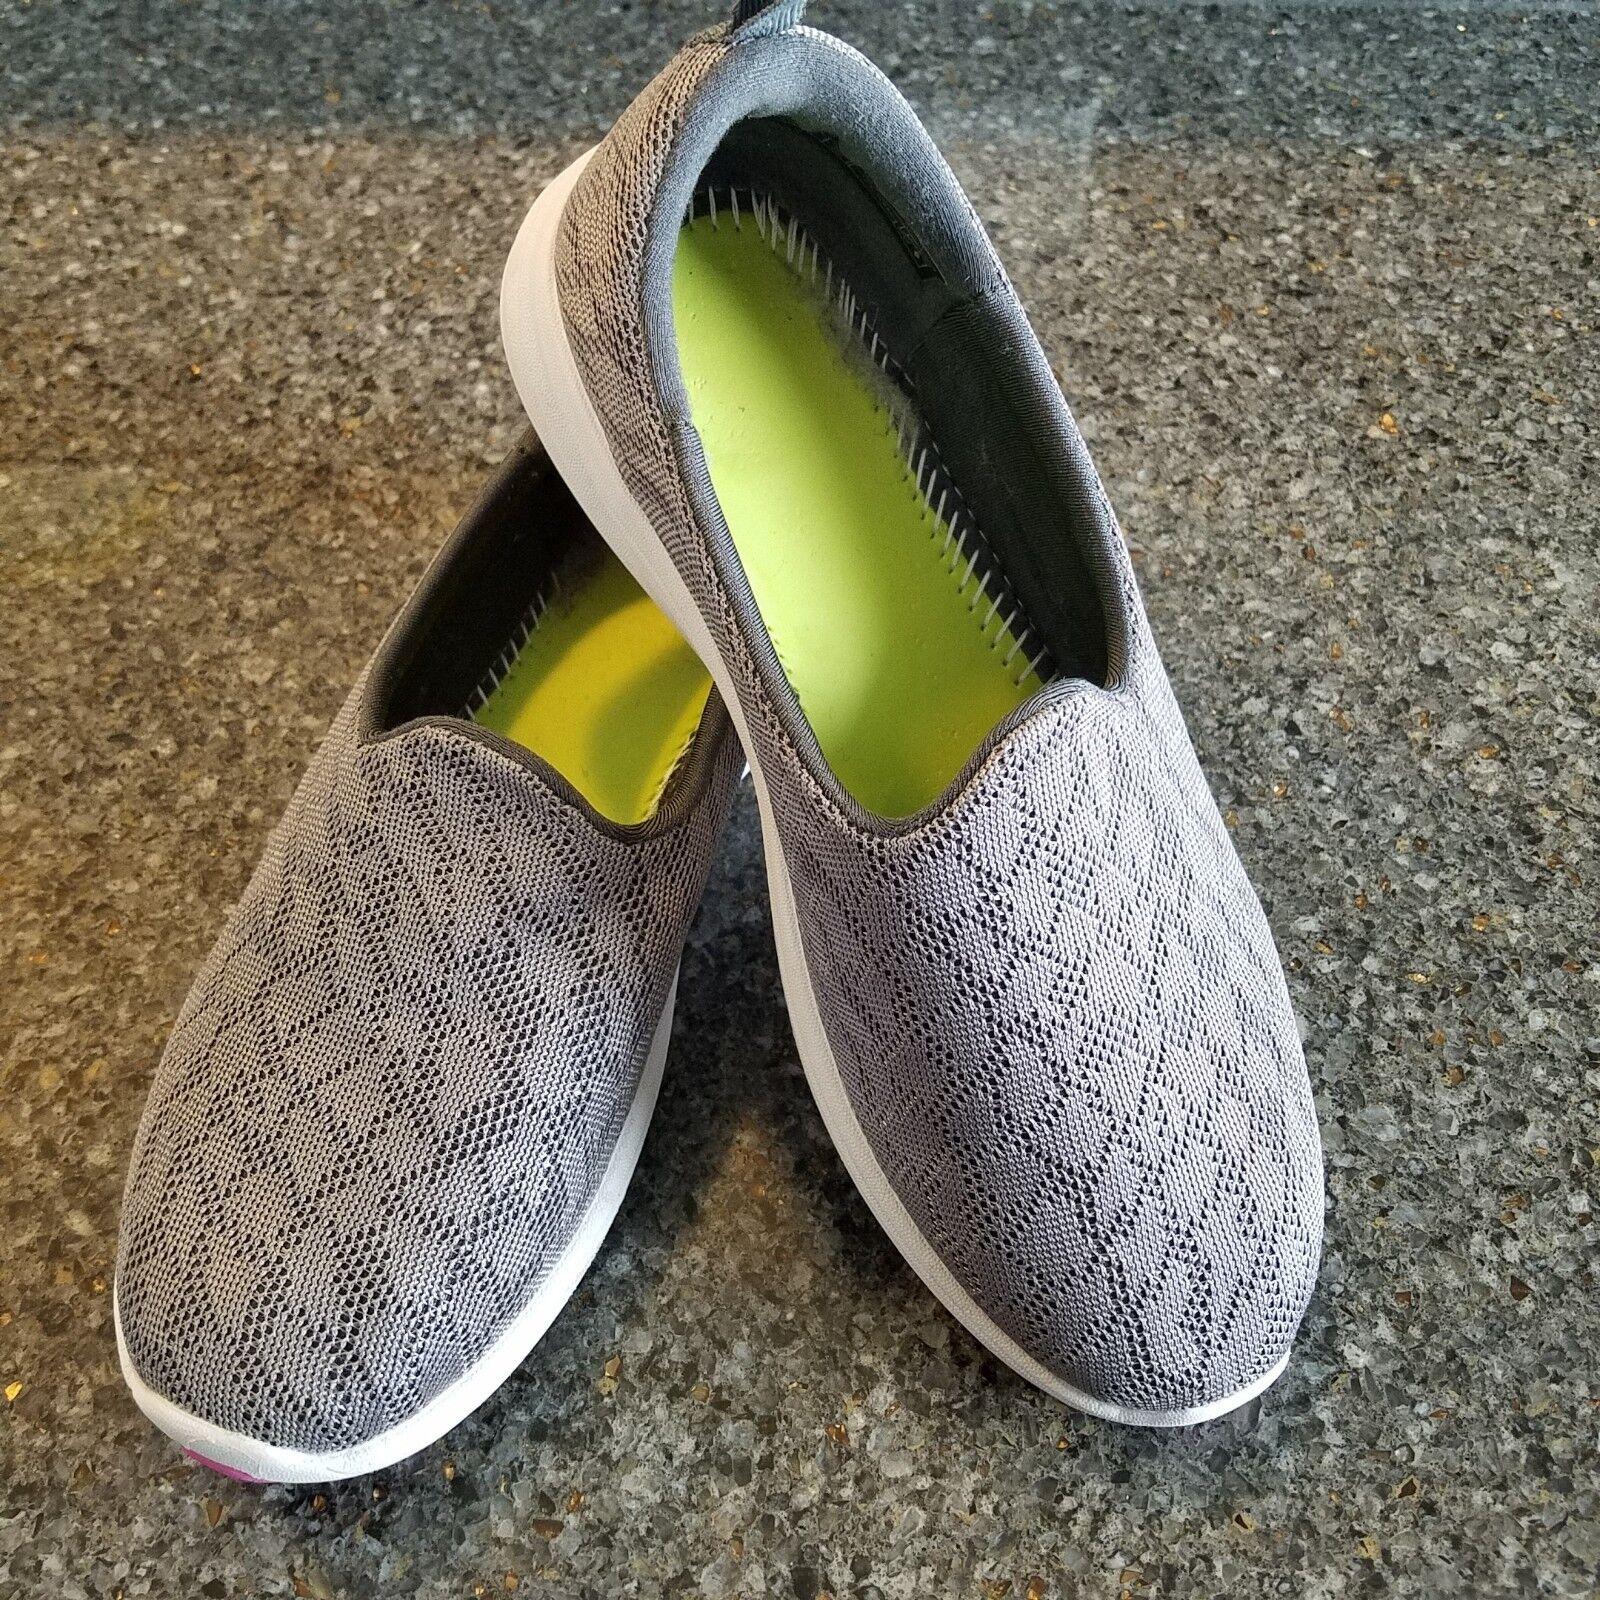 Vionic 331 Hydra AMS Slip On Sneaker Comfort Shoes Size 8 M